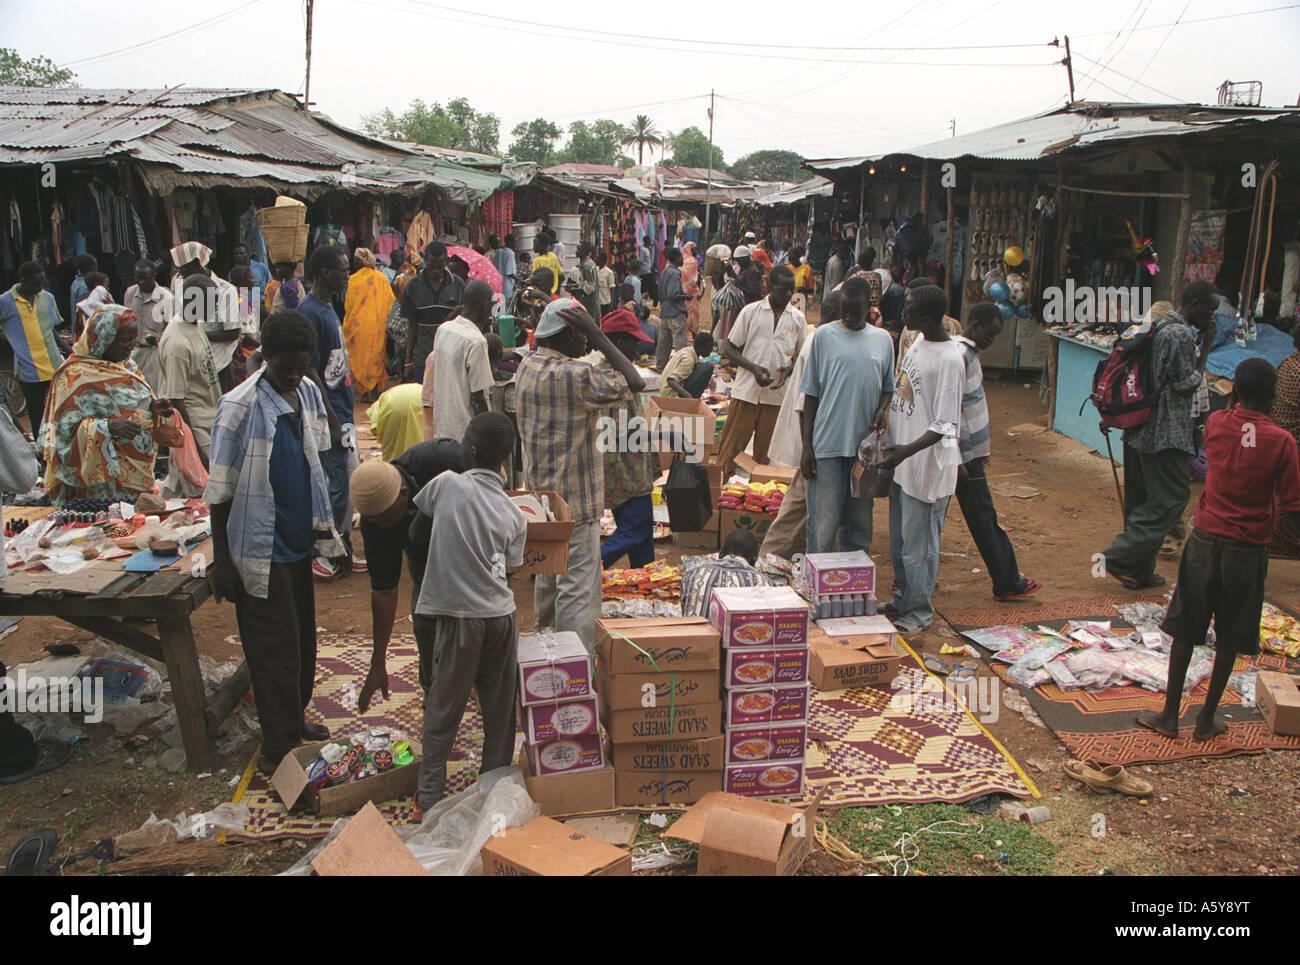 Juba market, South Sudan - Stock Image